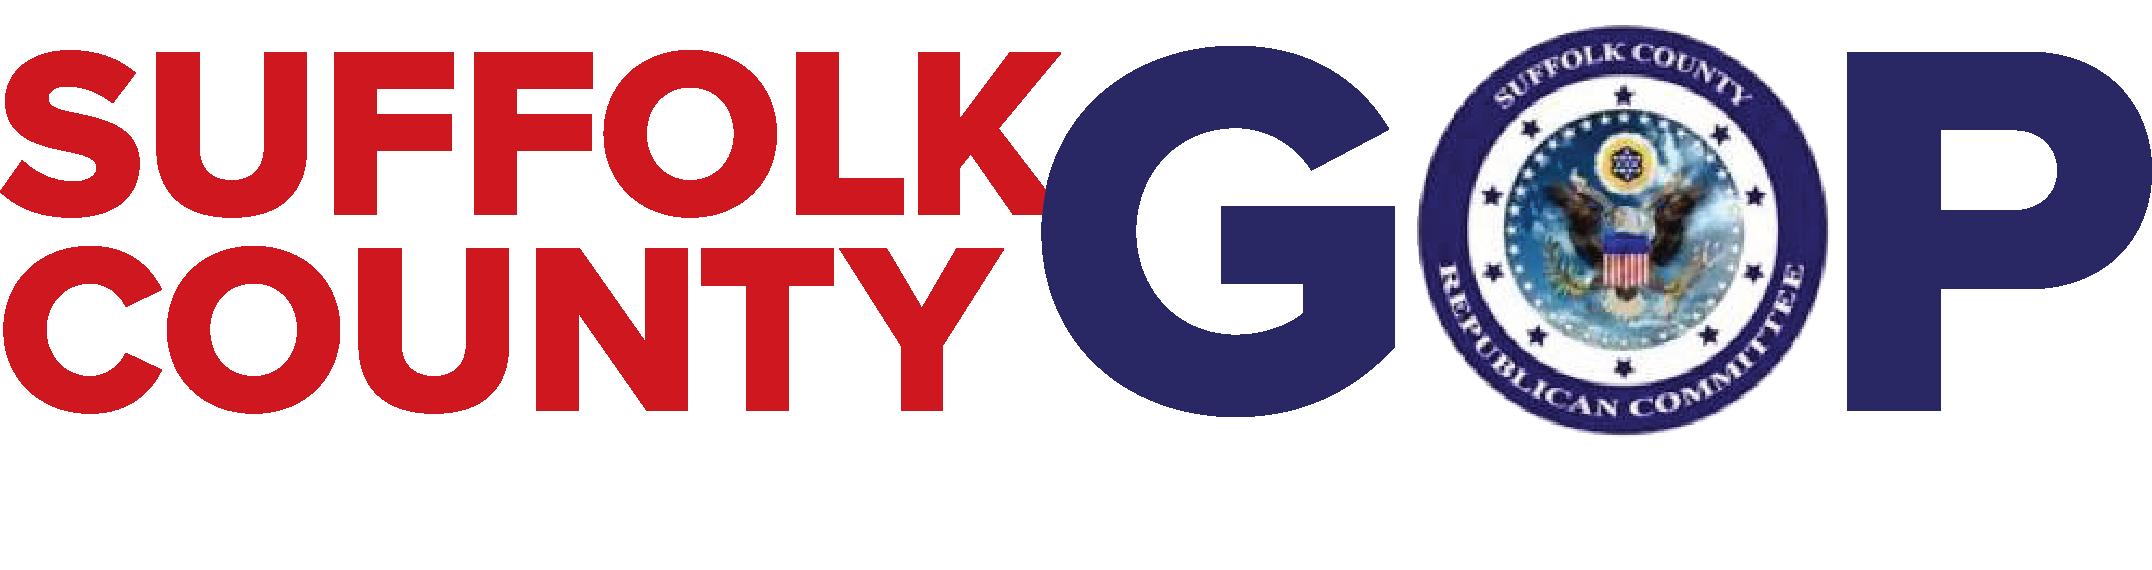 SuffolkCountyGOP-WH.png